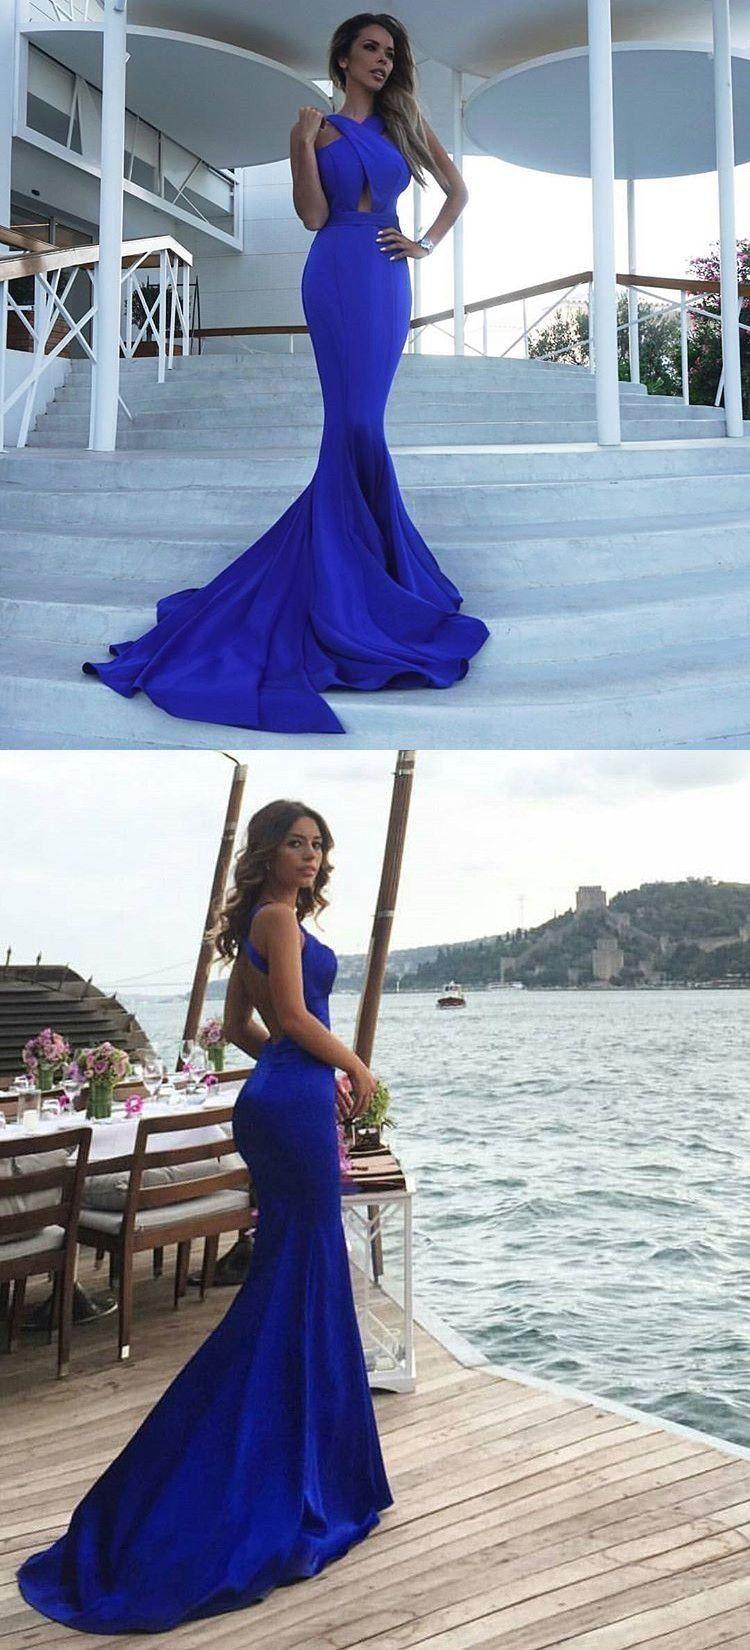 2018 Prom Dress Royal Blue Prom Dress Mermaid Long Prom Dress Elegant Royal B 1000 Backless Prom Dresses Prom Dresses Evening Dresses Prom